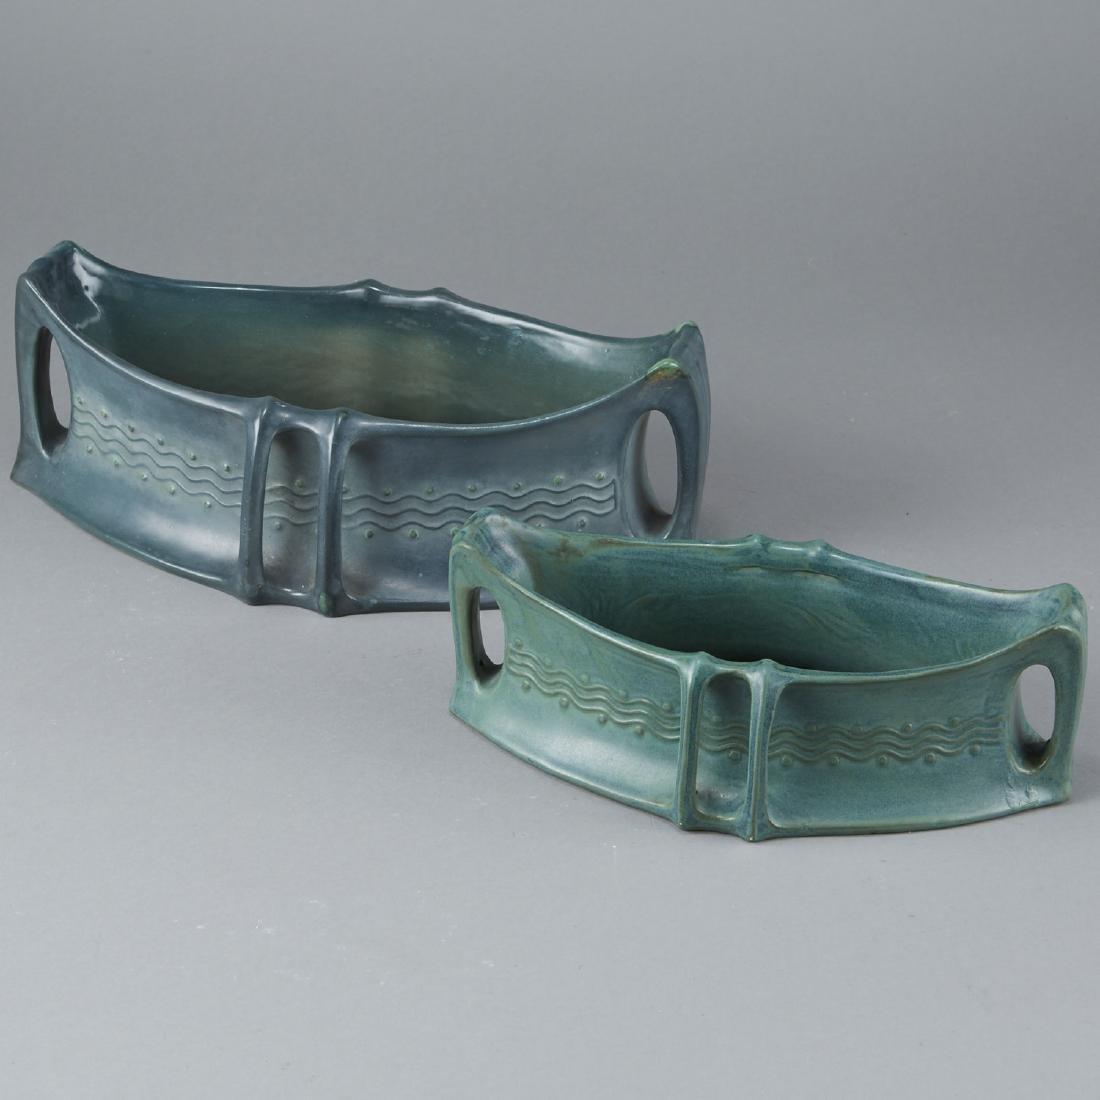 Pair of Amphora Arts and Crafts Basin - 4